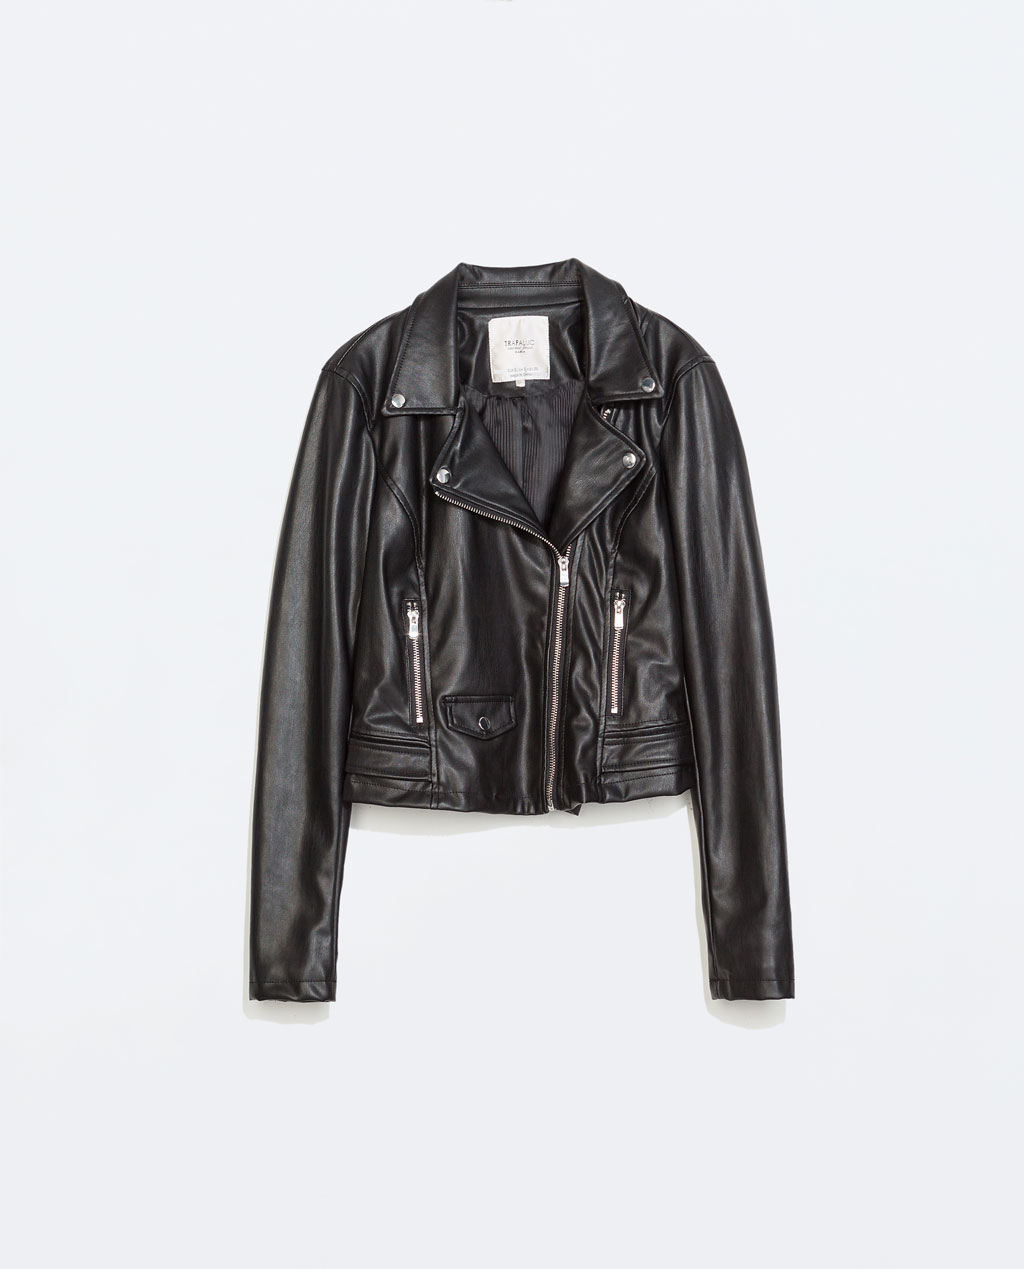 8x De perfecte leren biker jacket | Shopgids